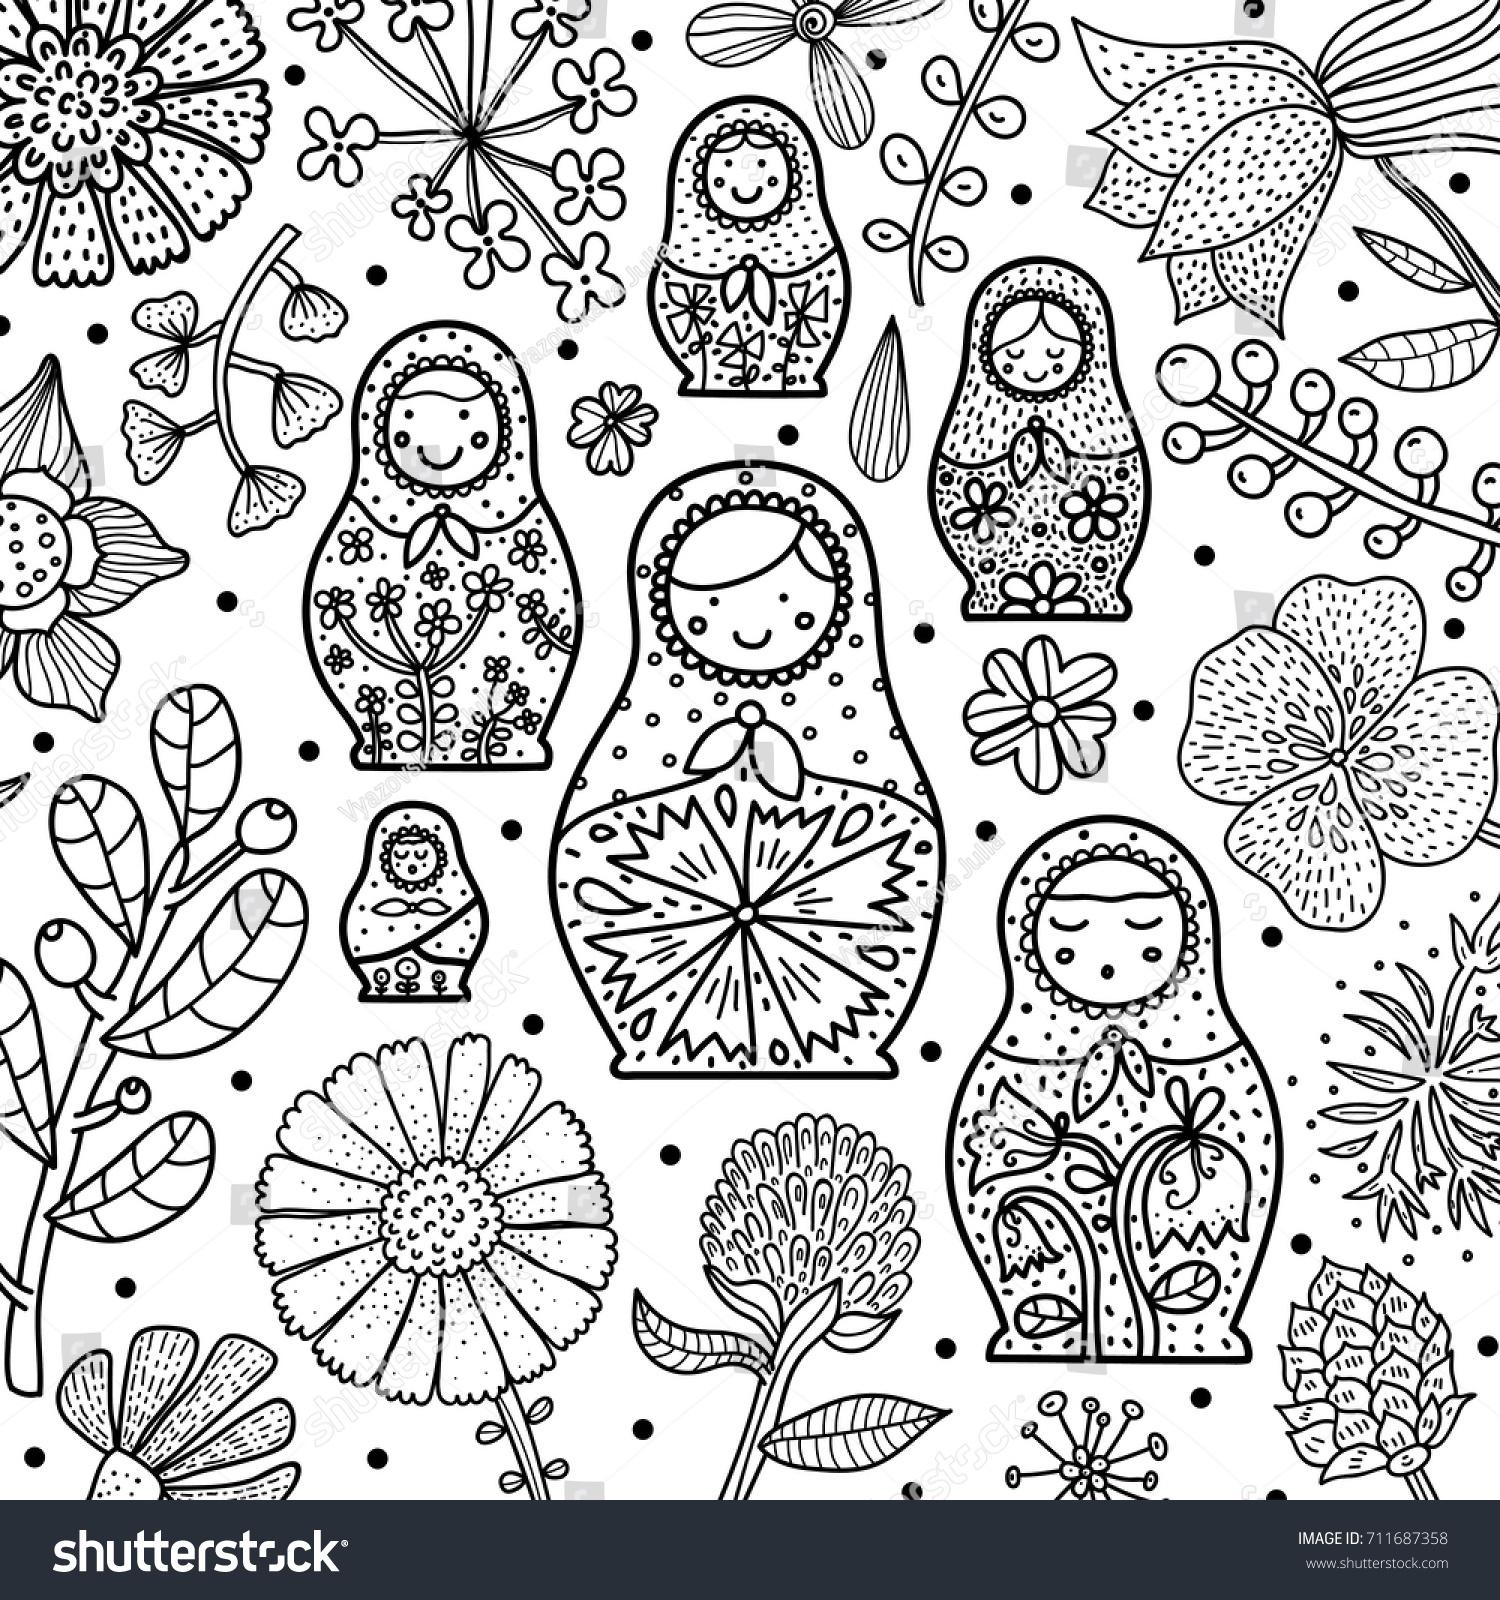 Nesting Dolls Coloring Sheet